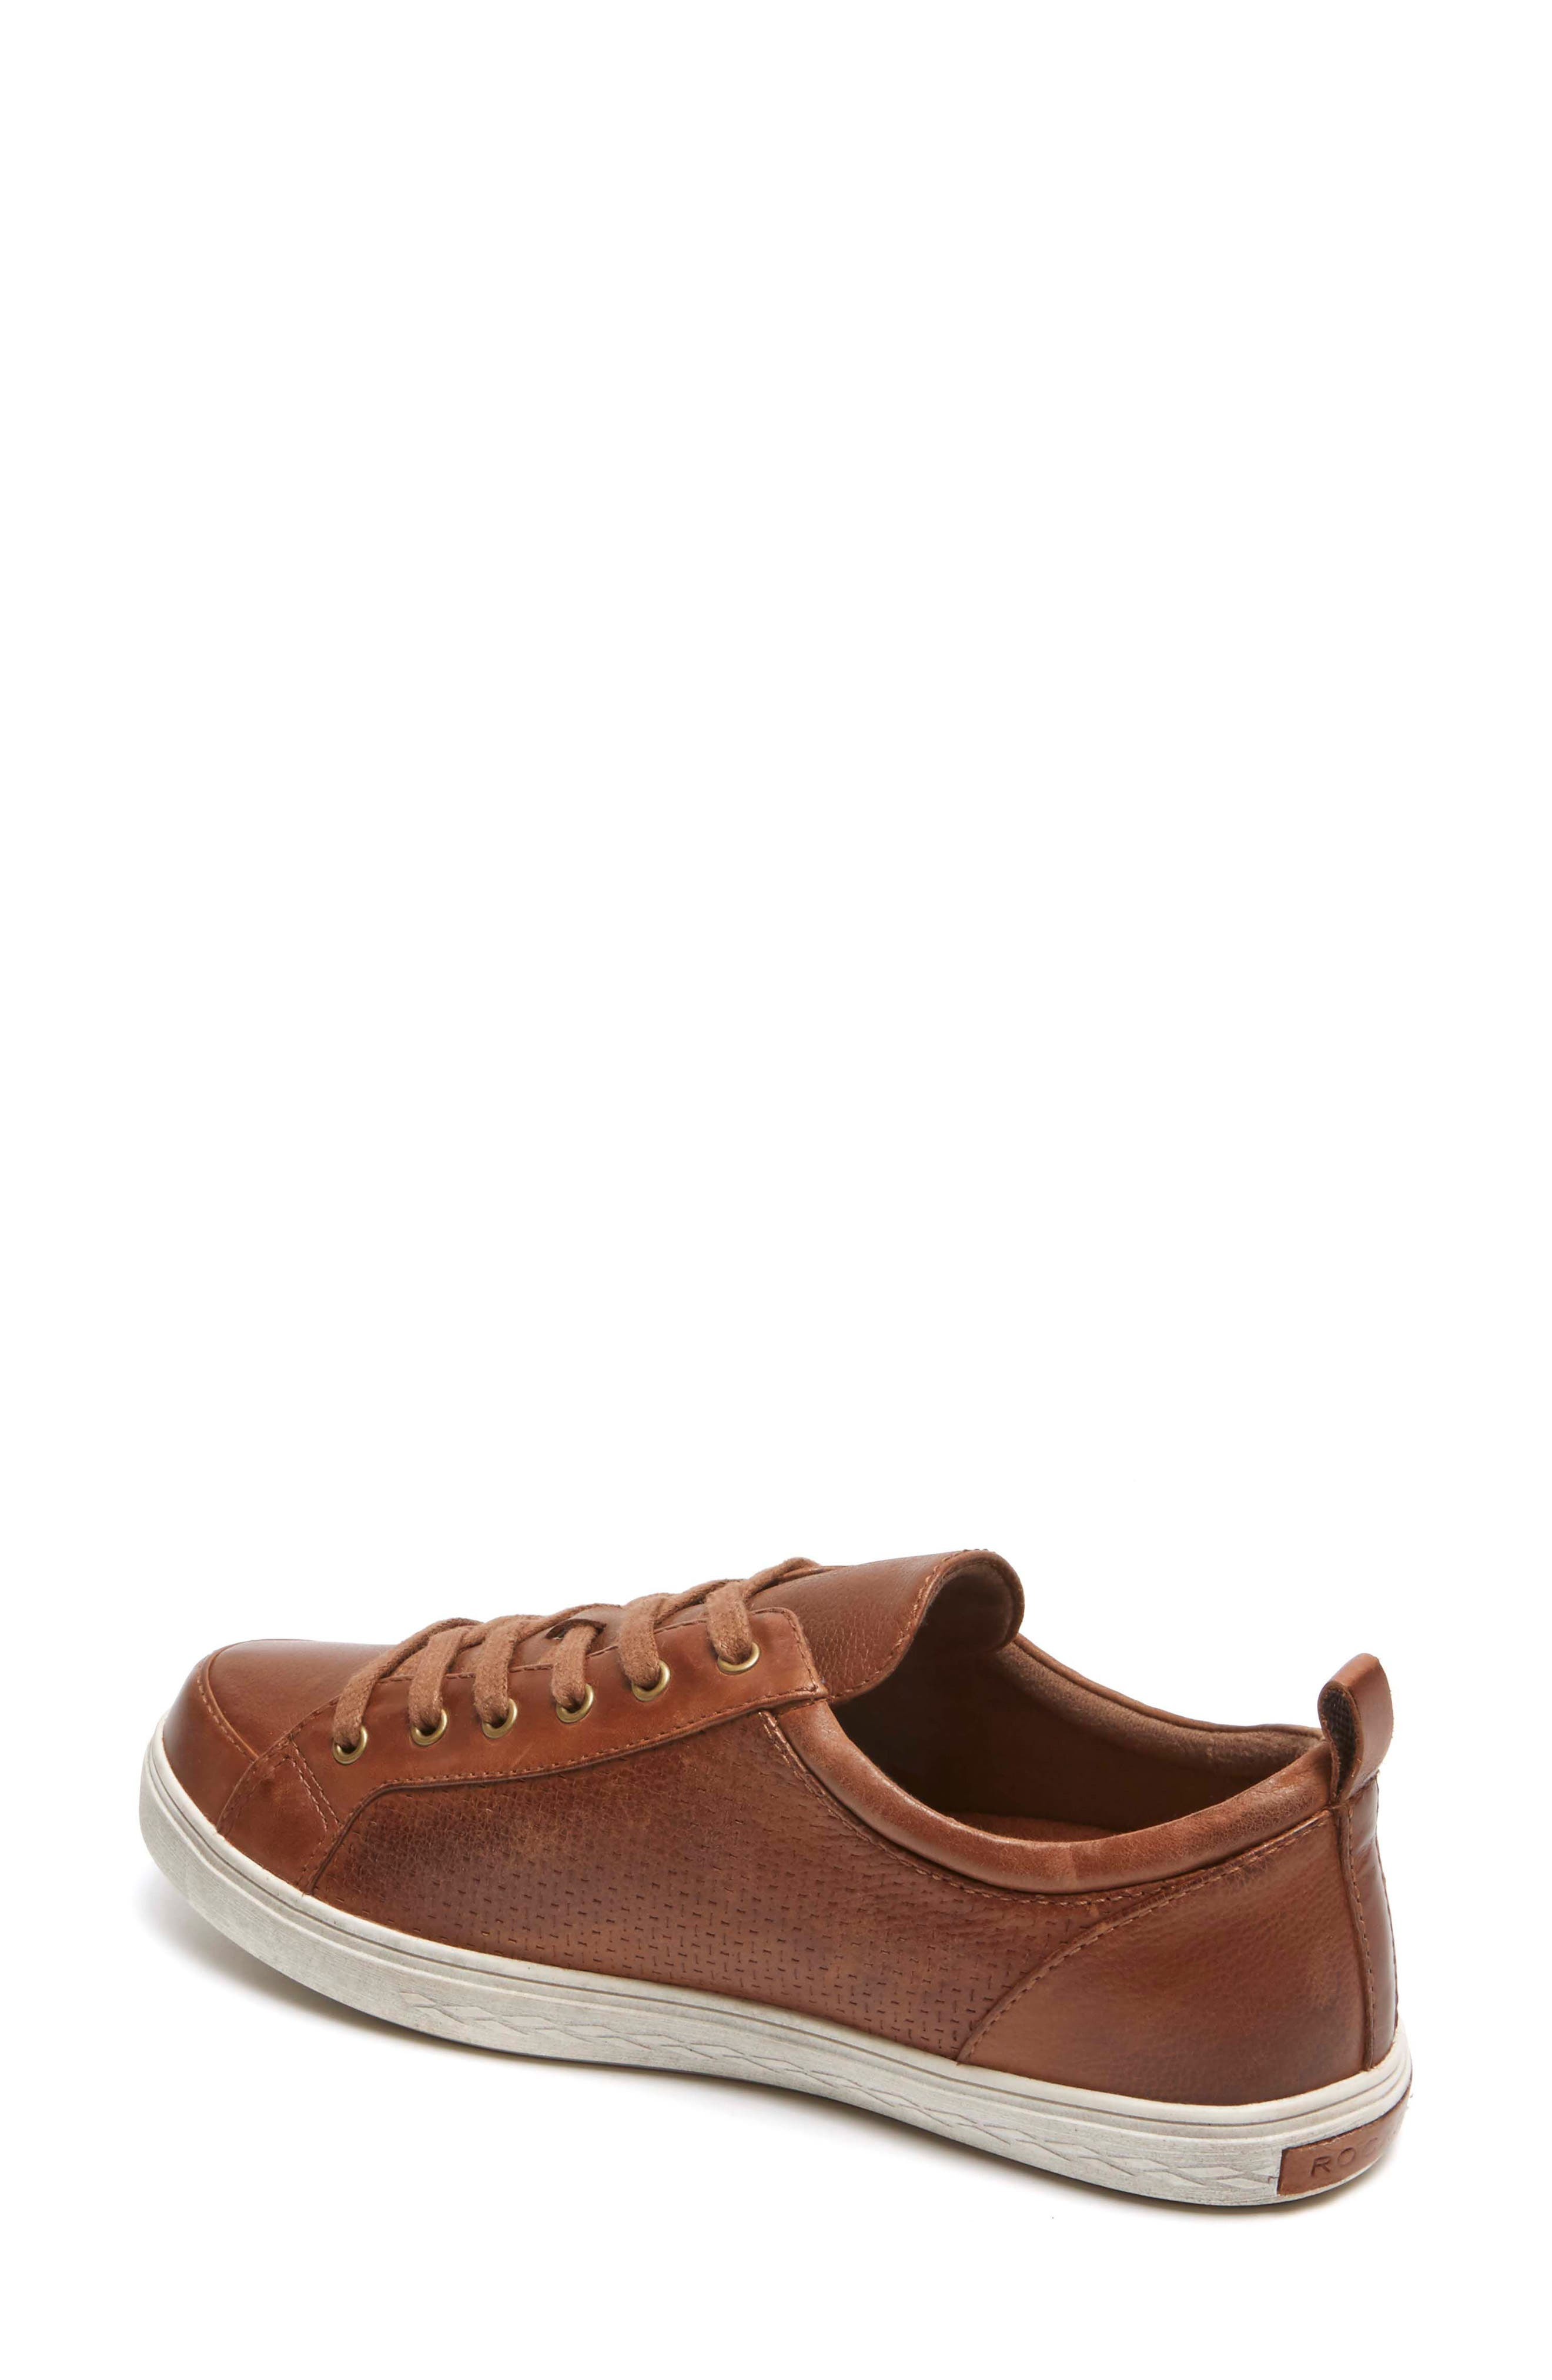 Willa Sneaker,                             Alternate thumbnail 2, color,                             Almond Leather